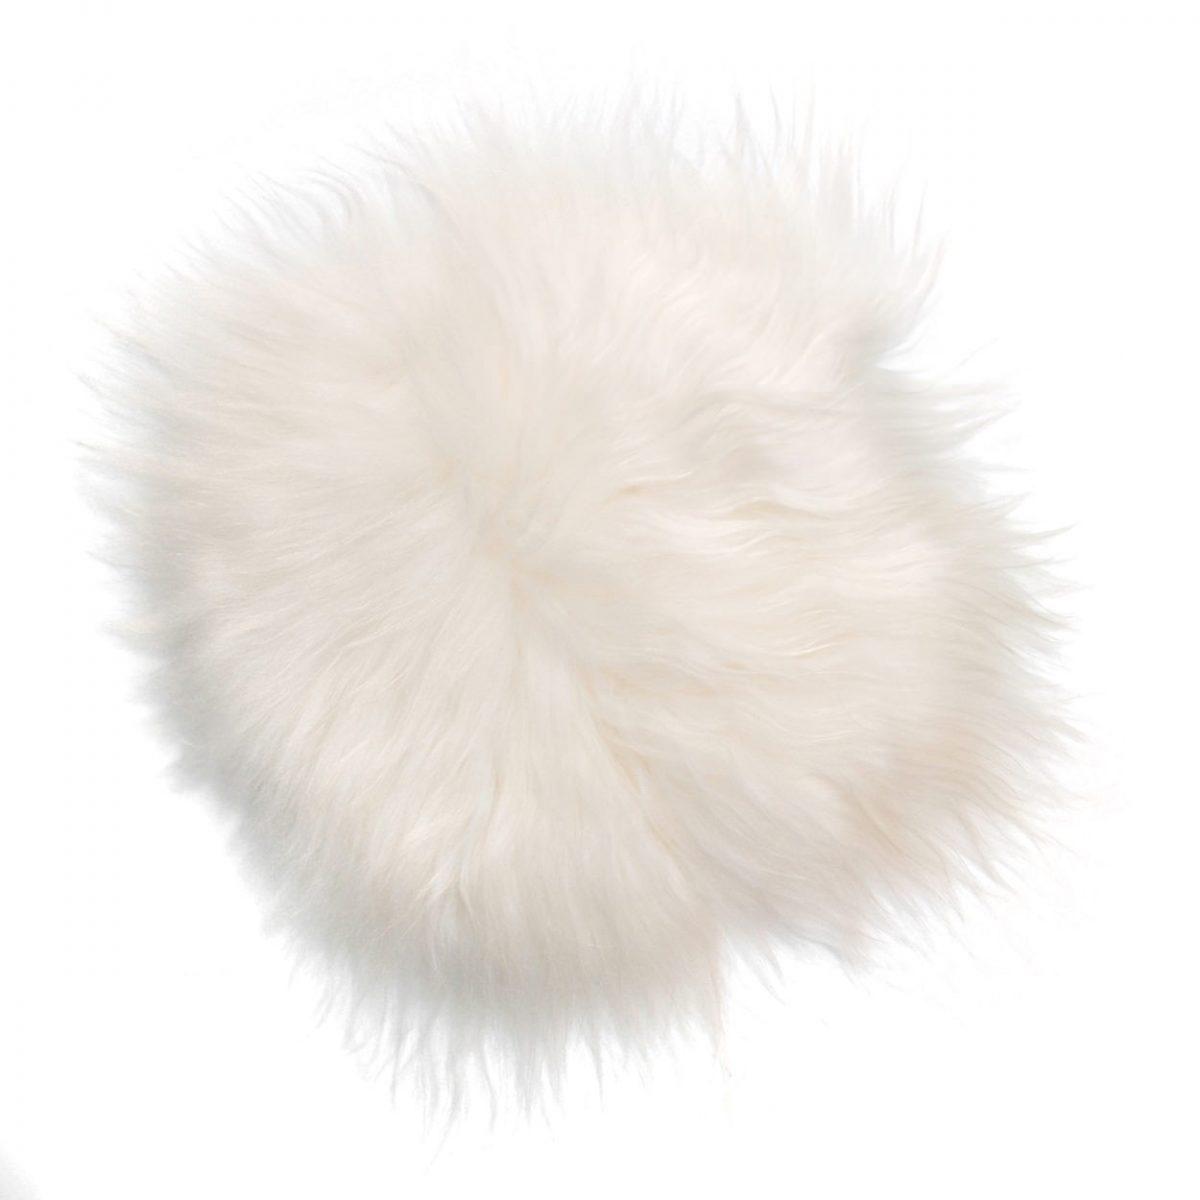 Stolsits fårskinn långhårigt svart vitt